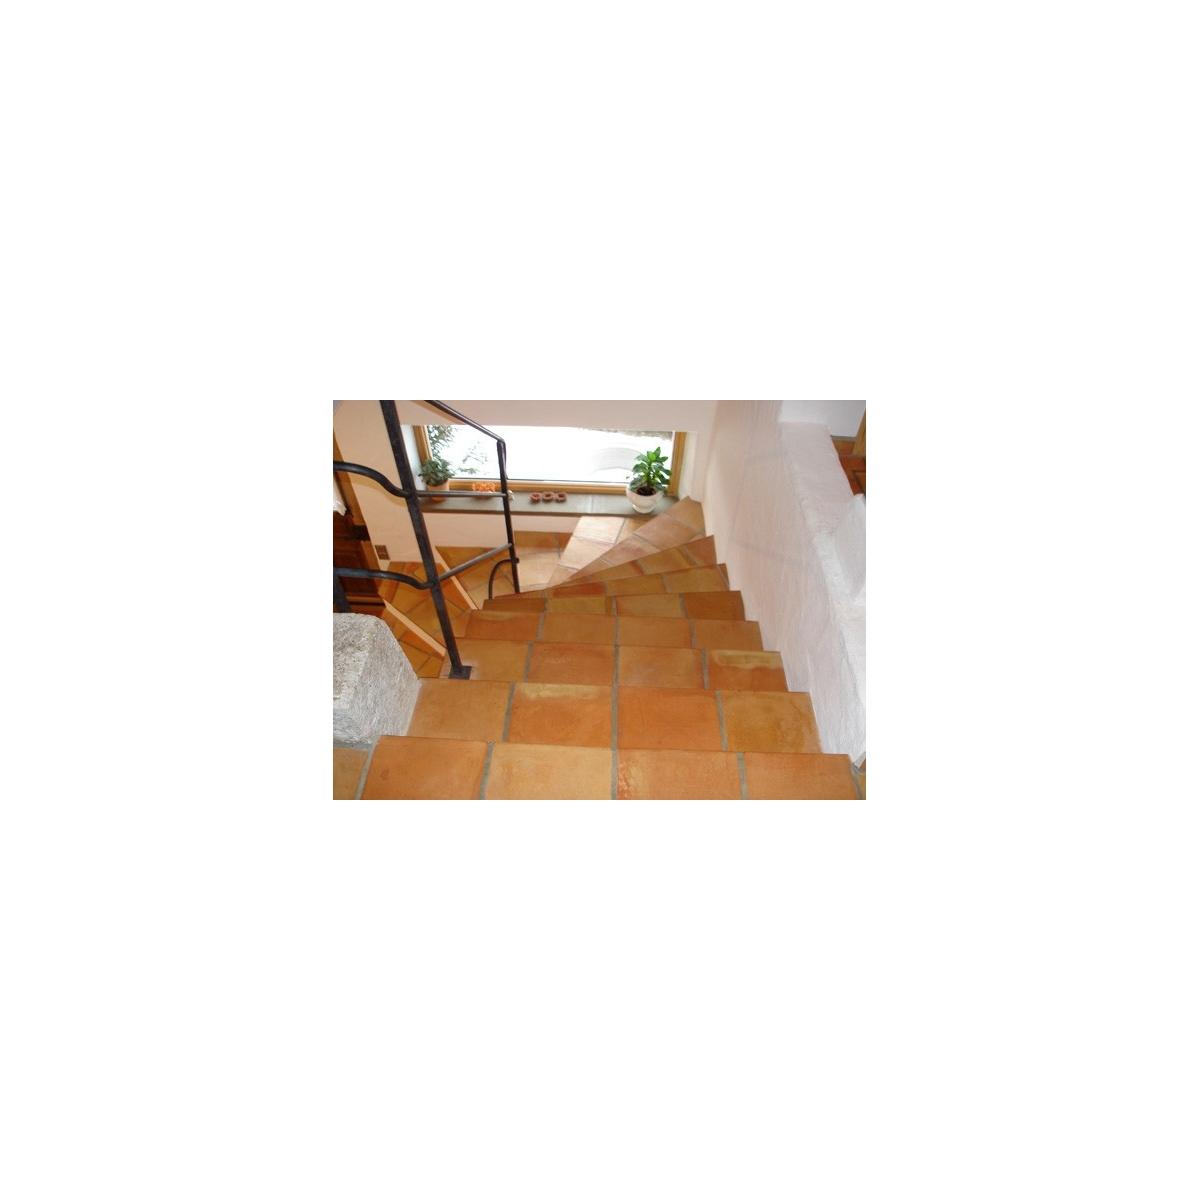 Peldaños de barro - Pavimento con Barro Terracota - Marca Anticfang